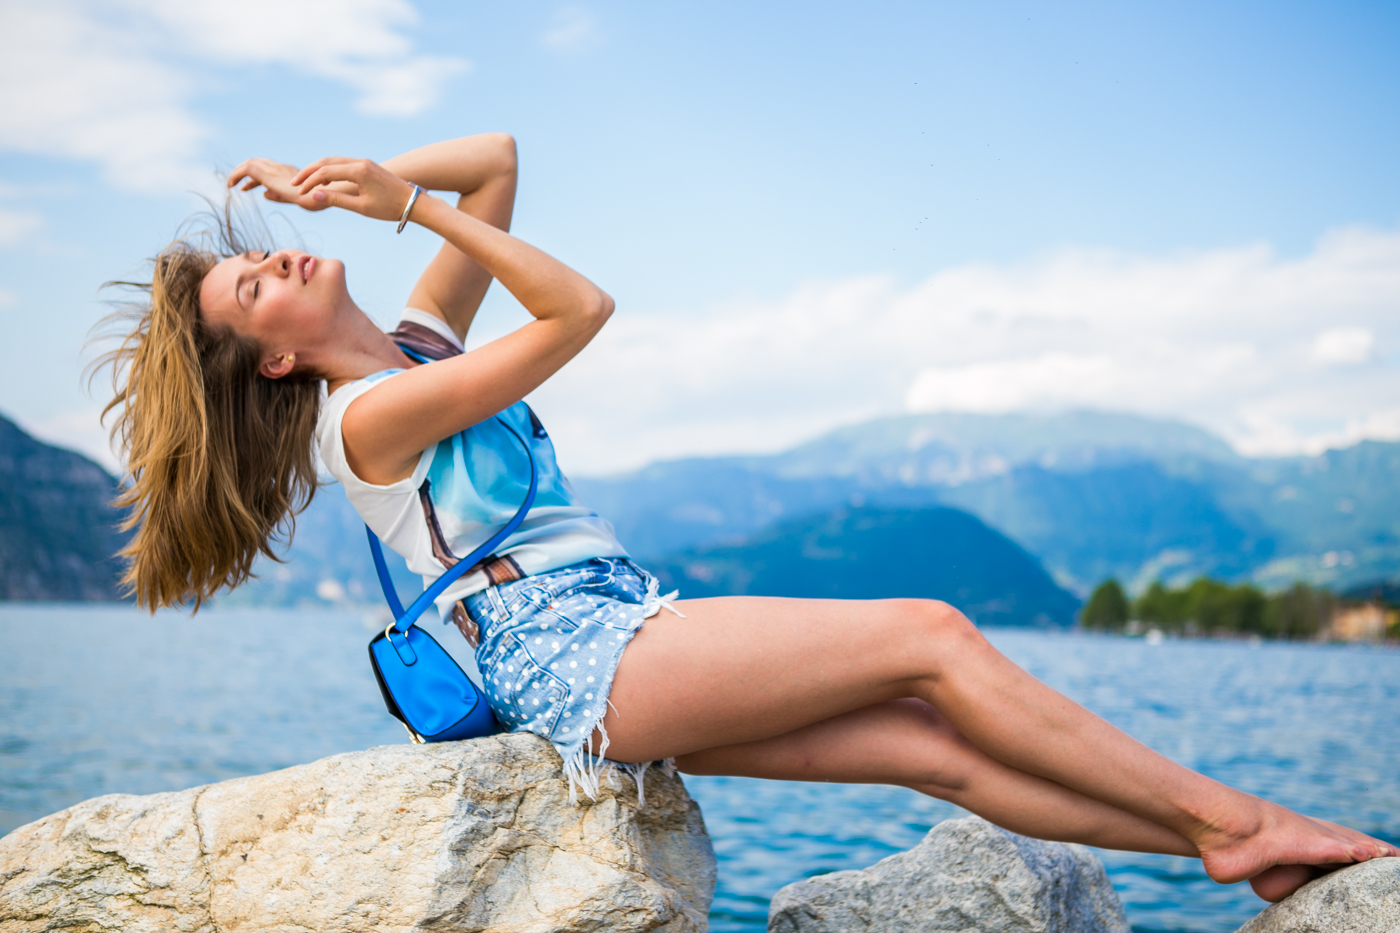 thecablook darya kamalova fashion blog street style denim shorts ash booties hm hat iseo lake piramidi di zona brescia-110